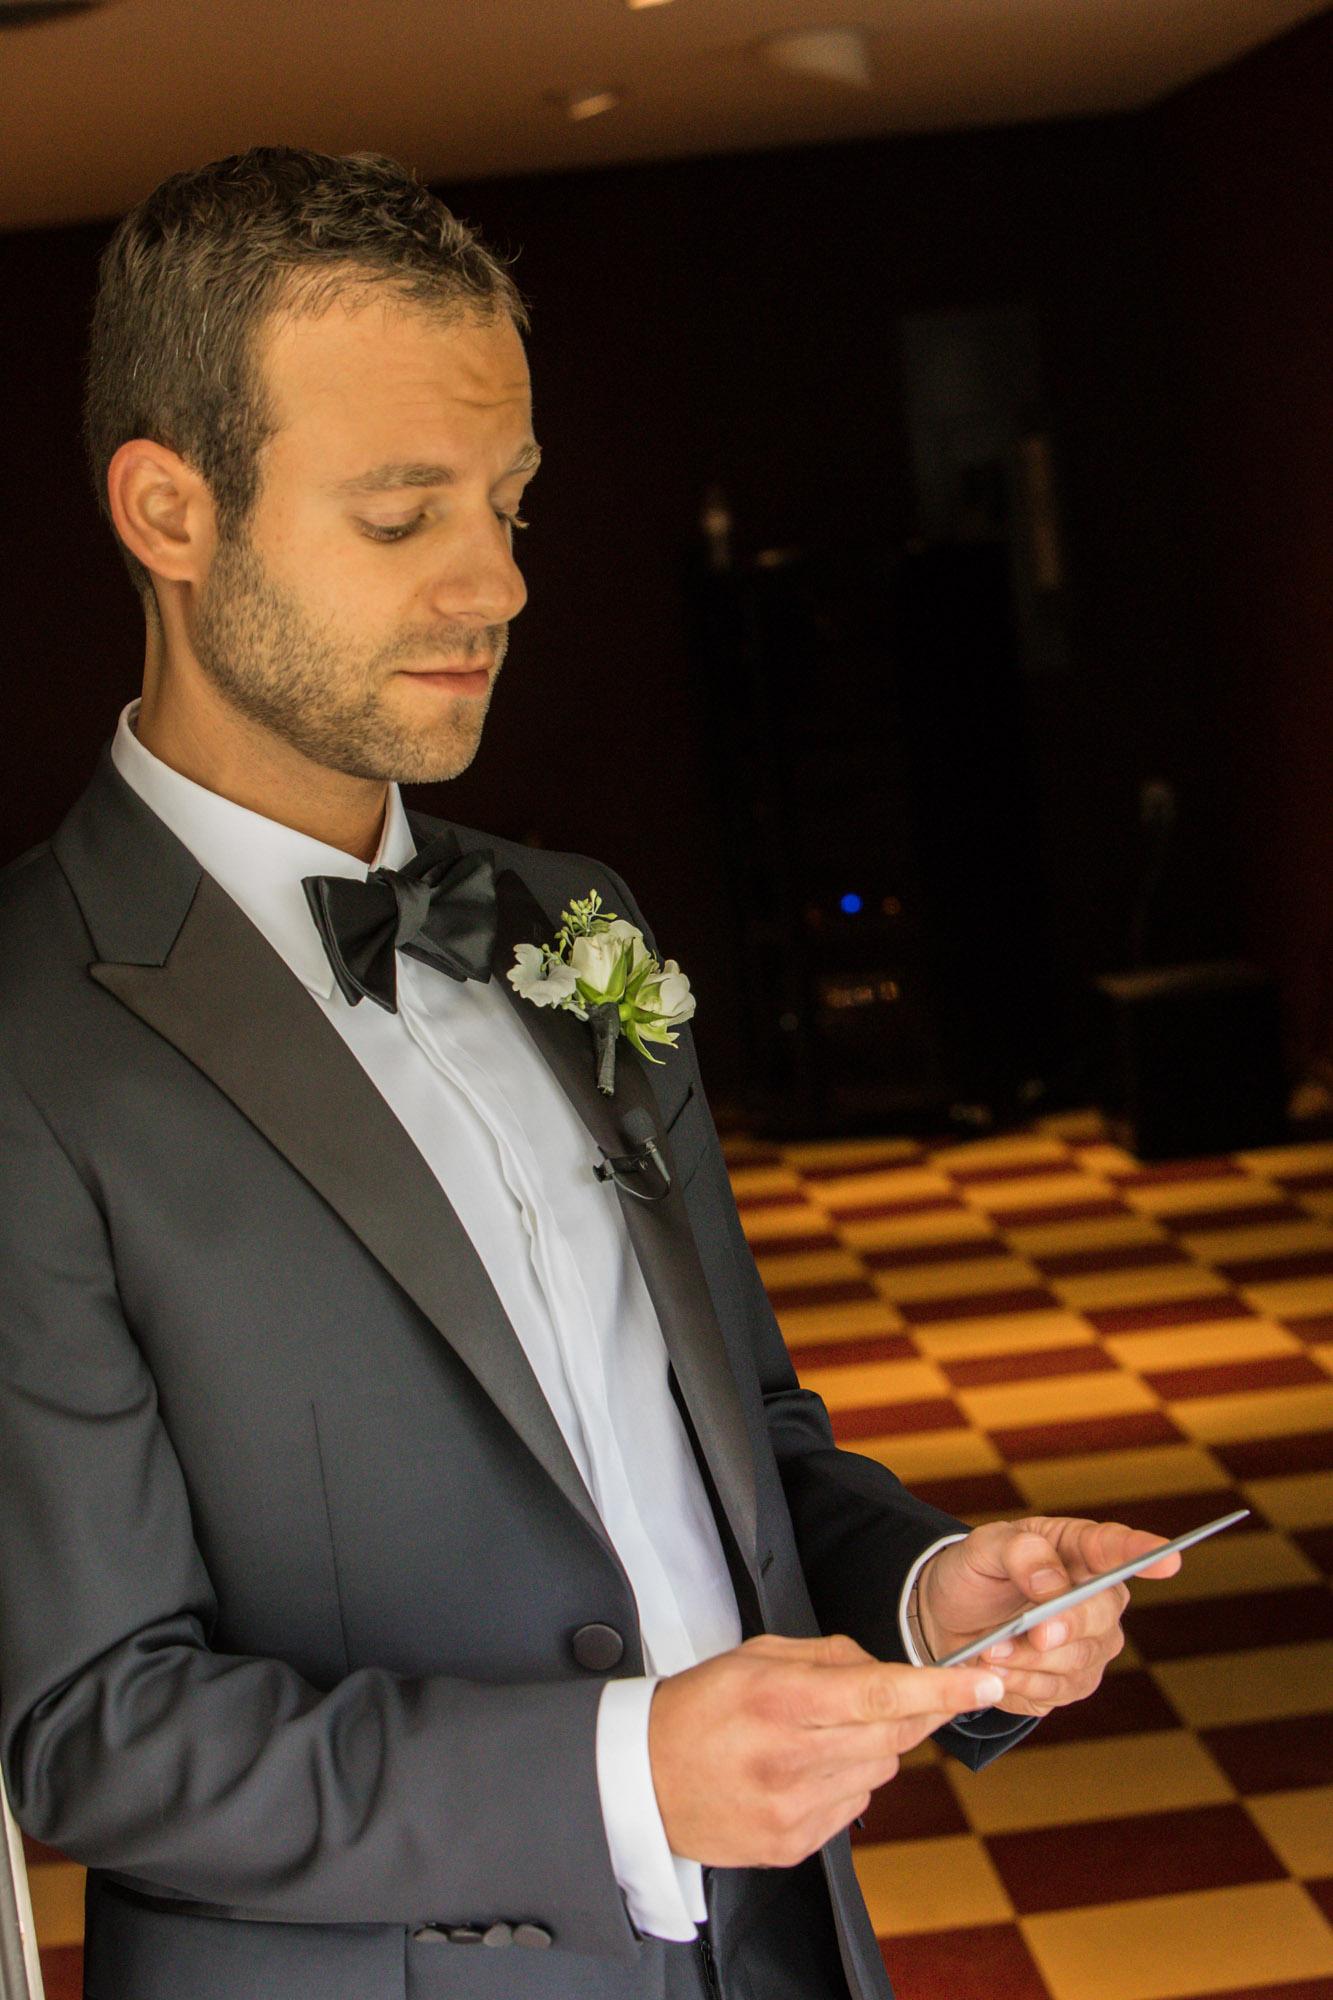 scranton_wedding_photographer_lettieri_pa (9 of 34).jpg